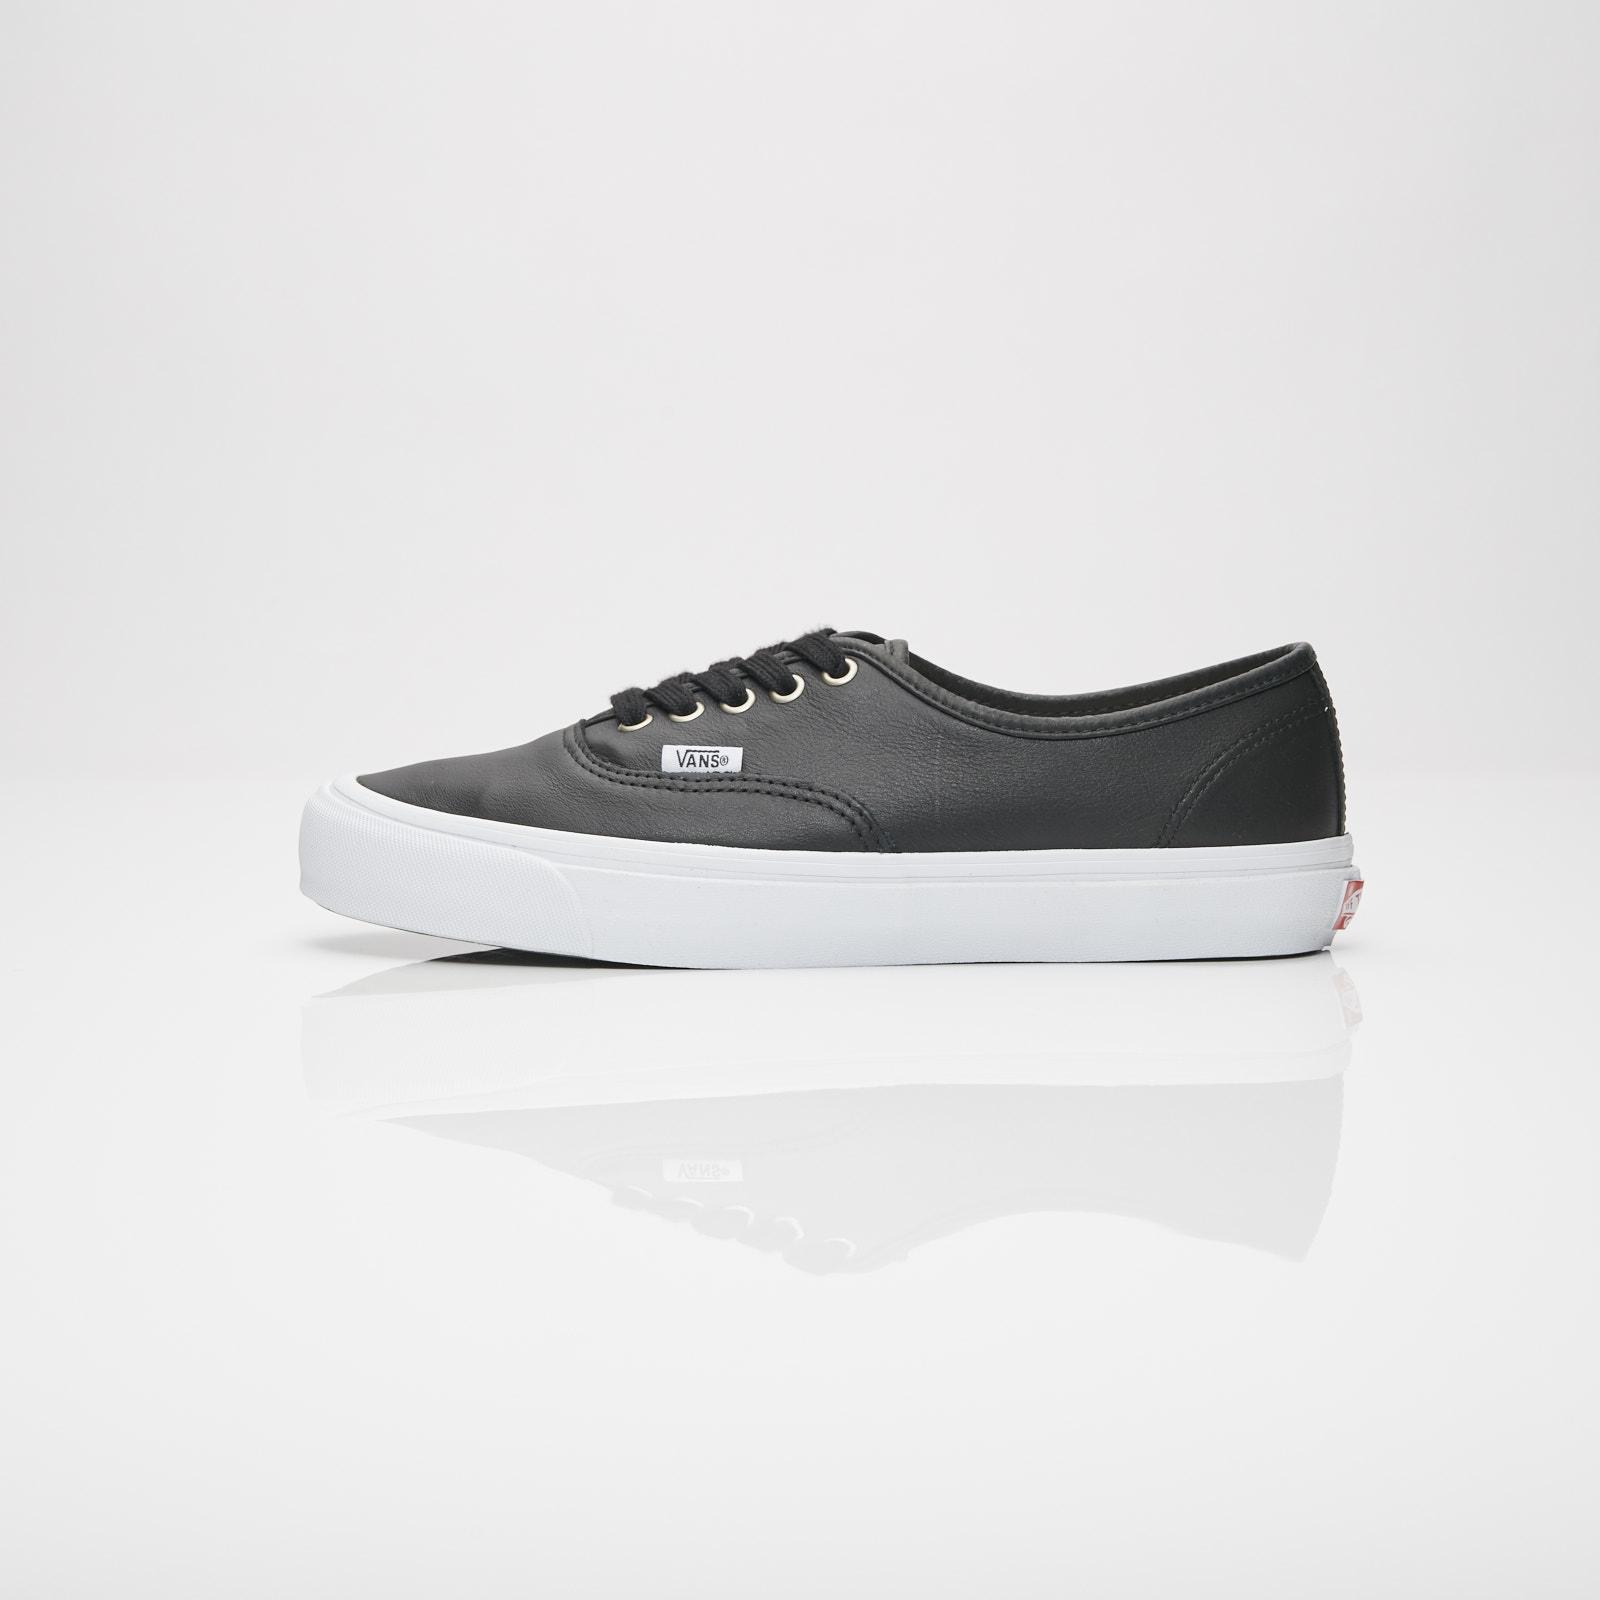 5a72840db0 Vans OG Authentic LX - Vnudd1ns - Sneakersnstuff